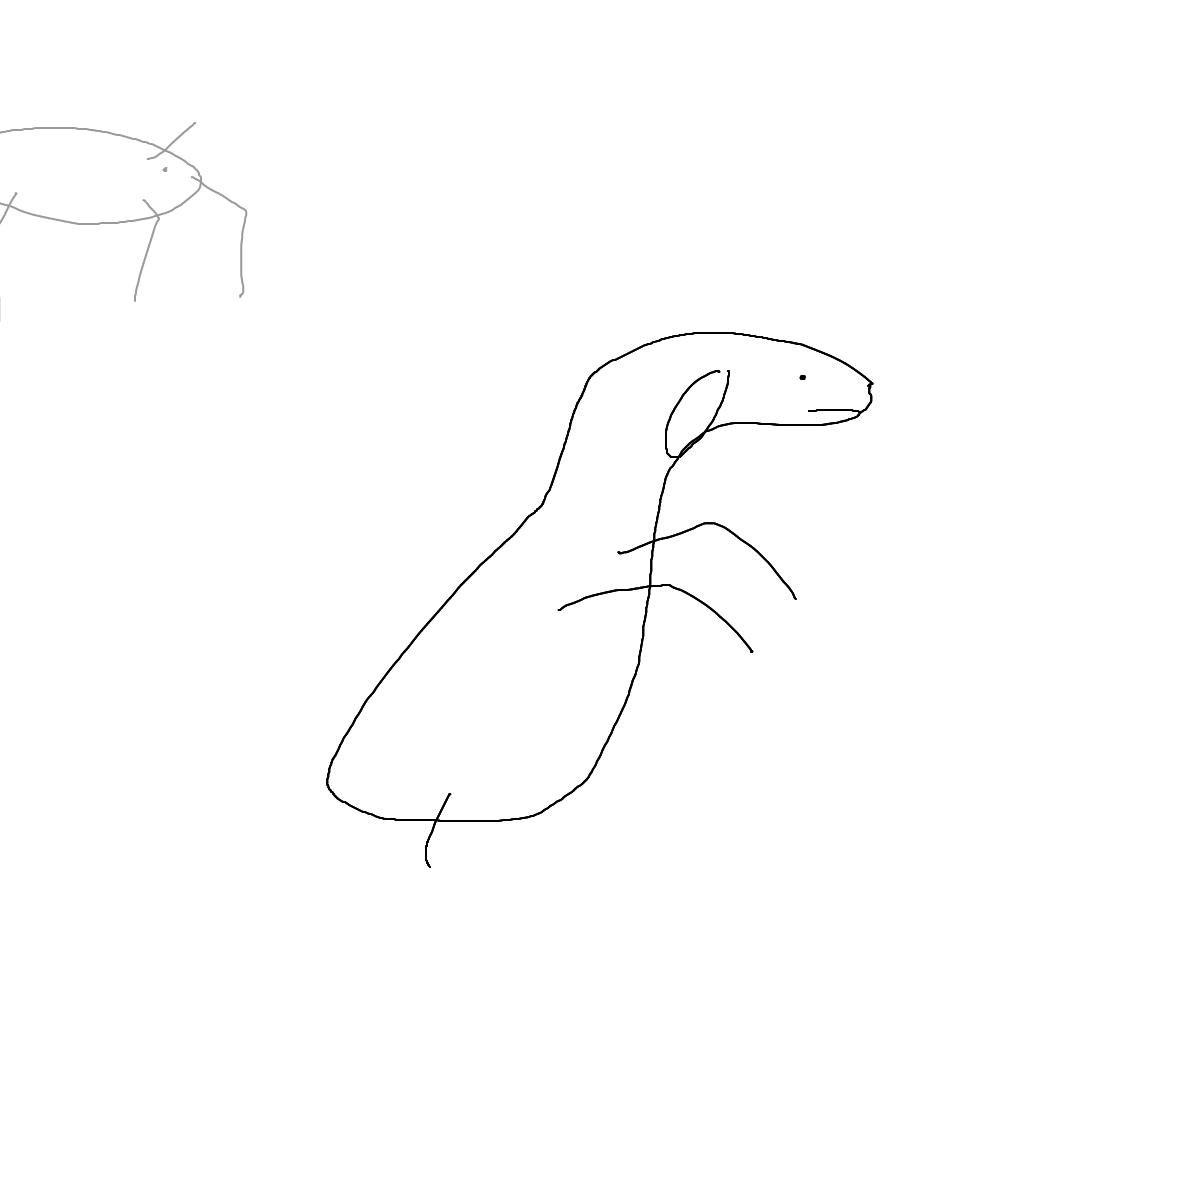 BAAAM drawing#2131 lat:52.4750442504882800lng: 13.4067945480346680